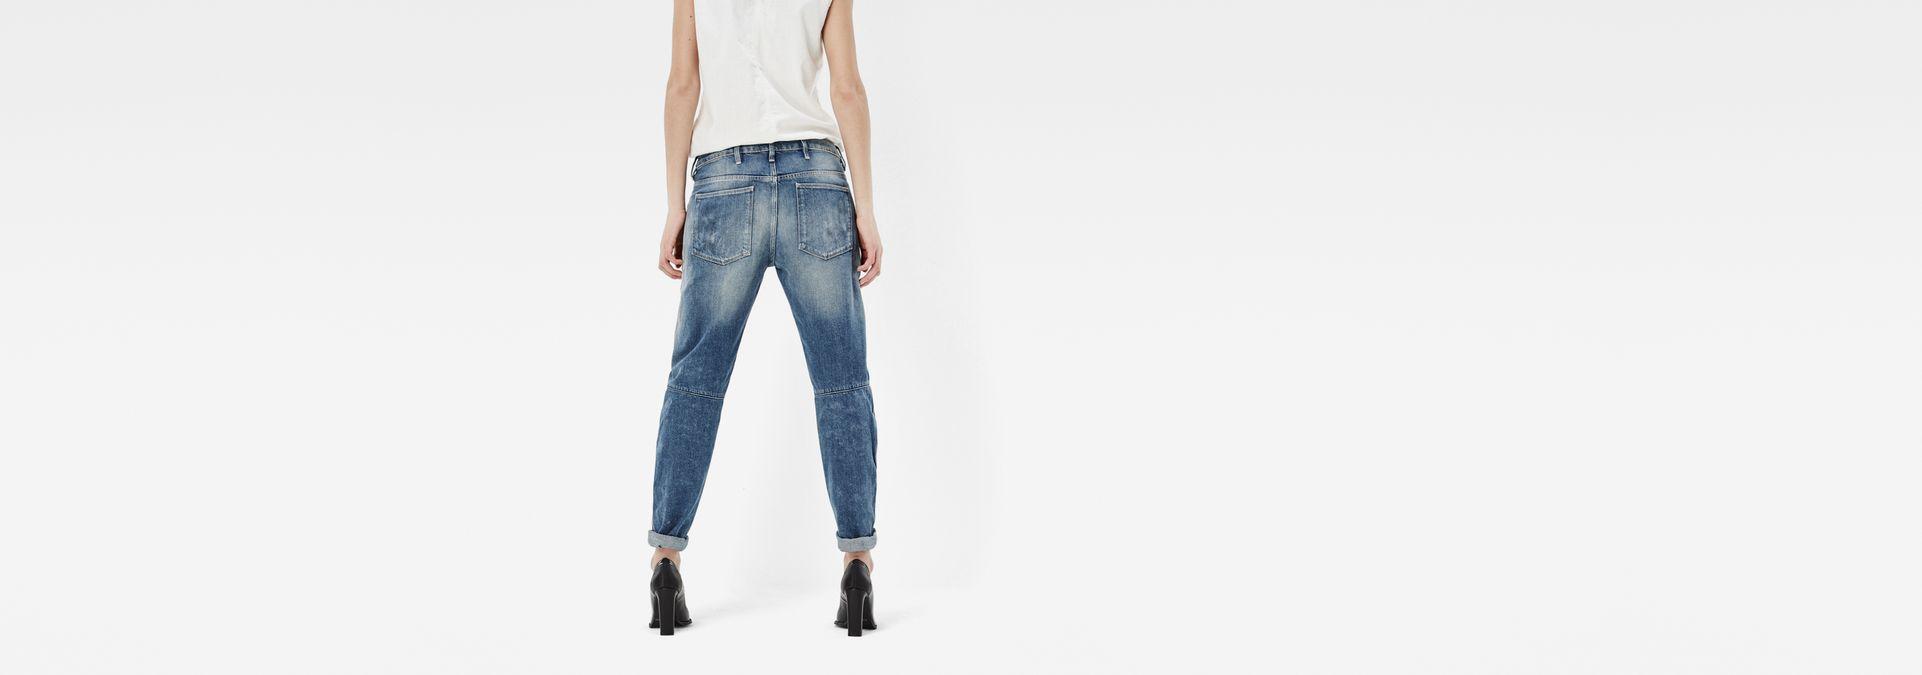 5620 g star elwood 3d low waist boyfriend jeans g star raw. Black Bedroom Furniture Sets. Home Design Ideas